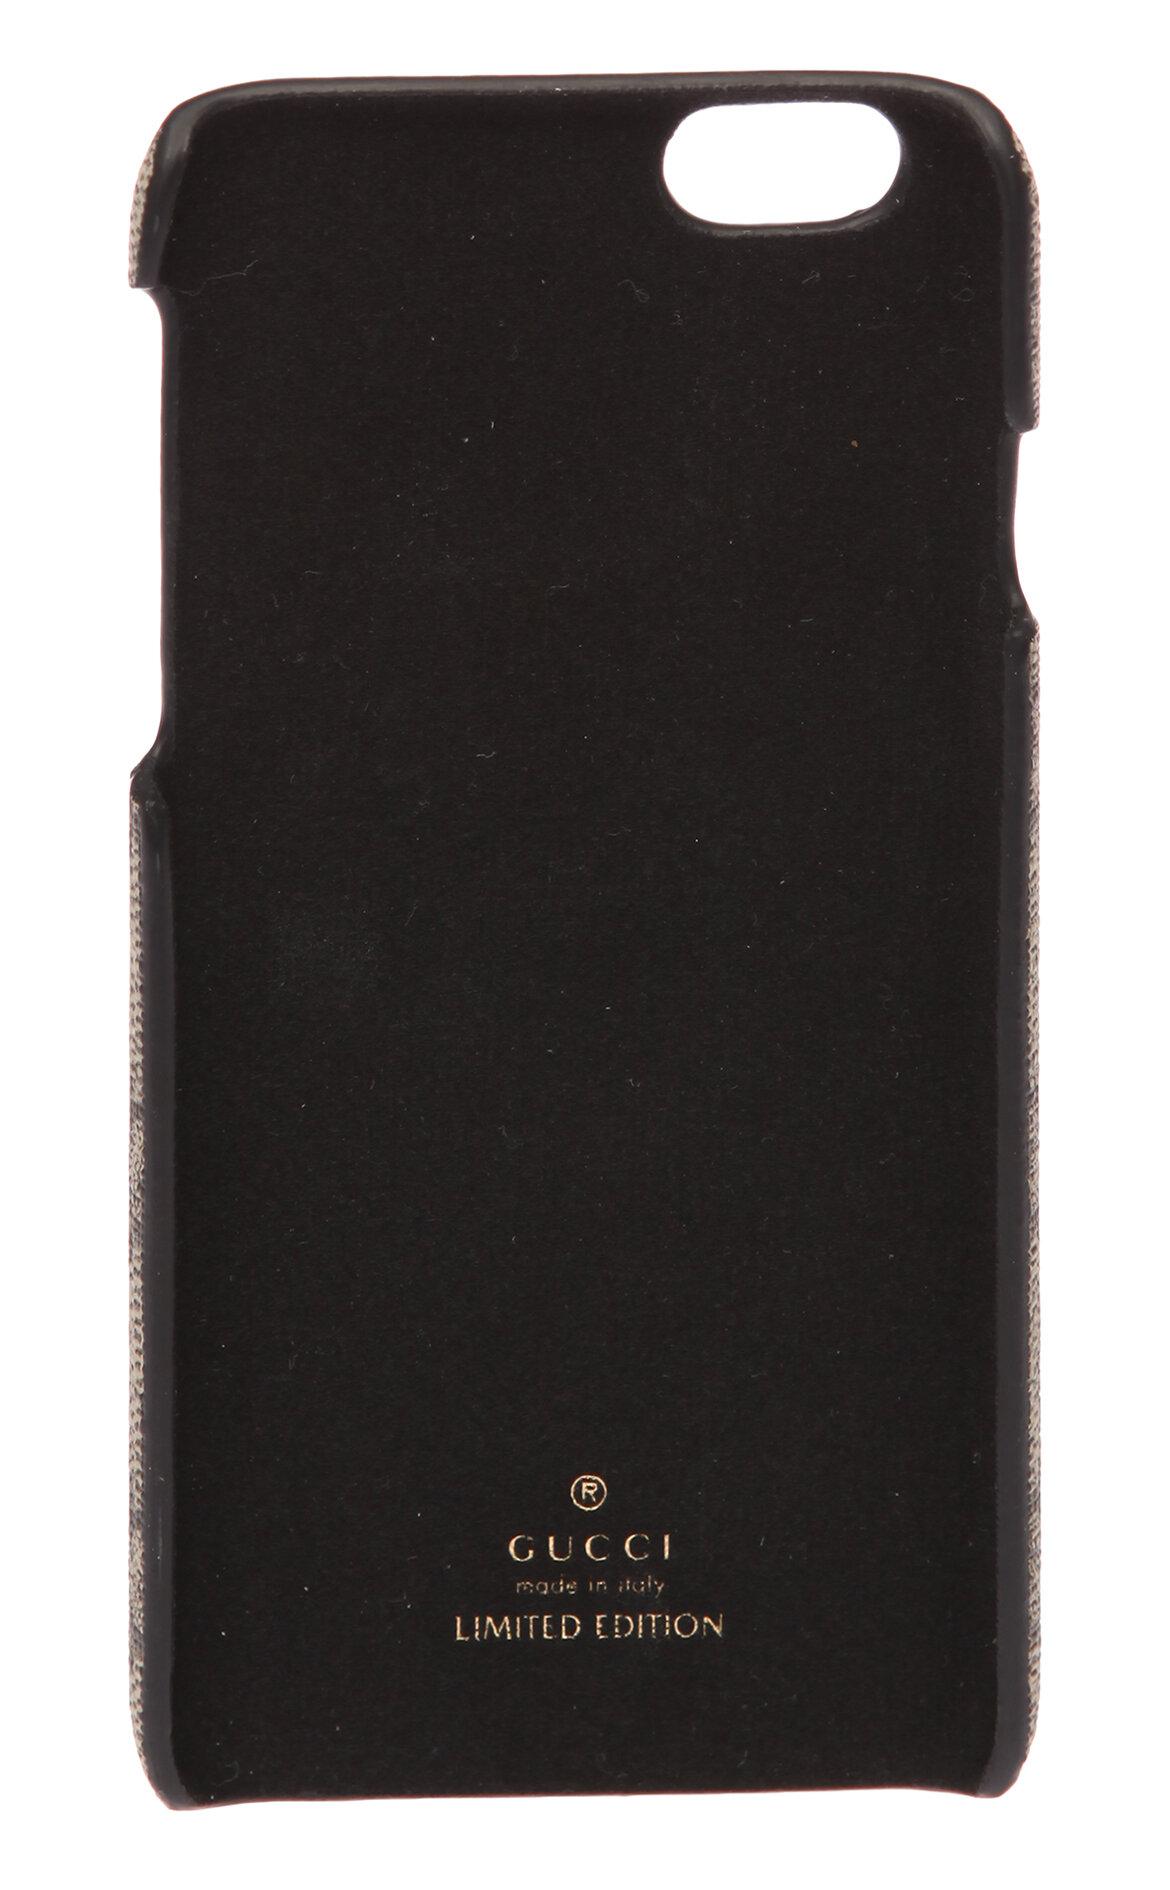 Gucci iPhone 6 Plus Telefon Kılıfı